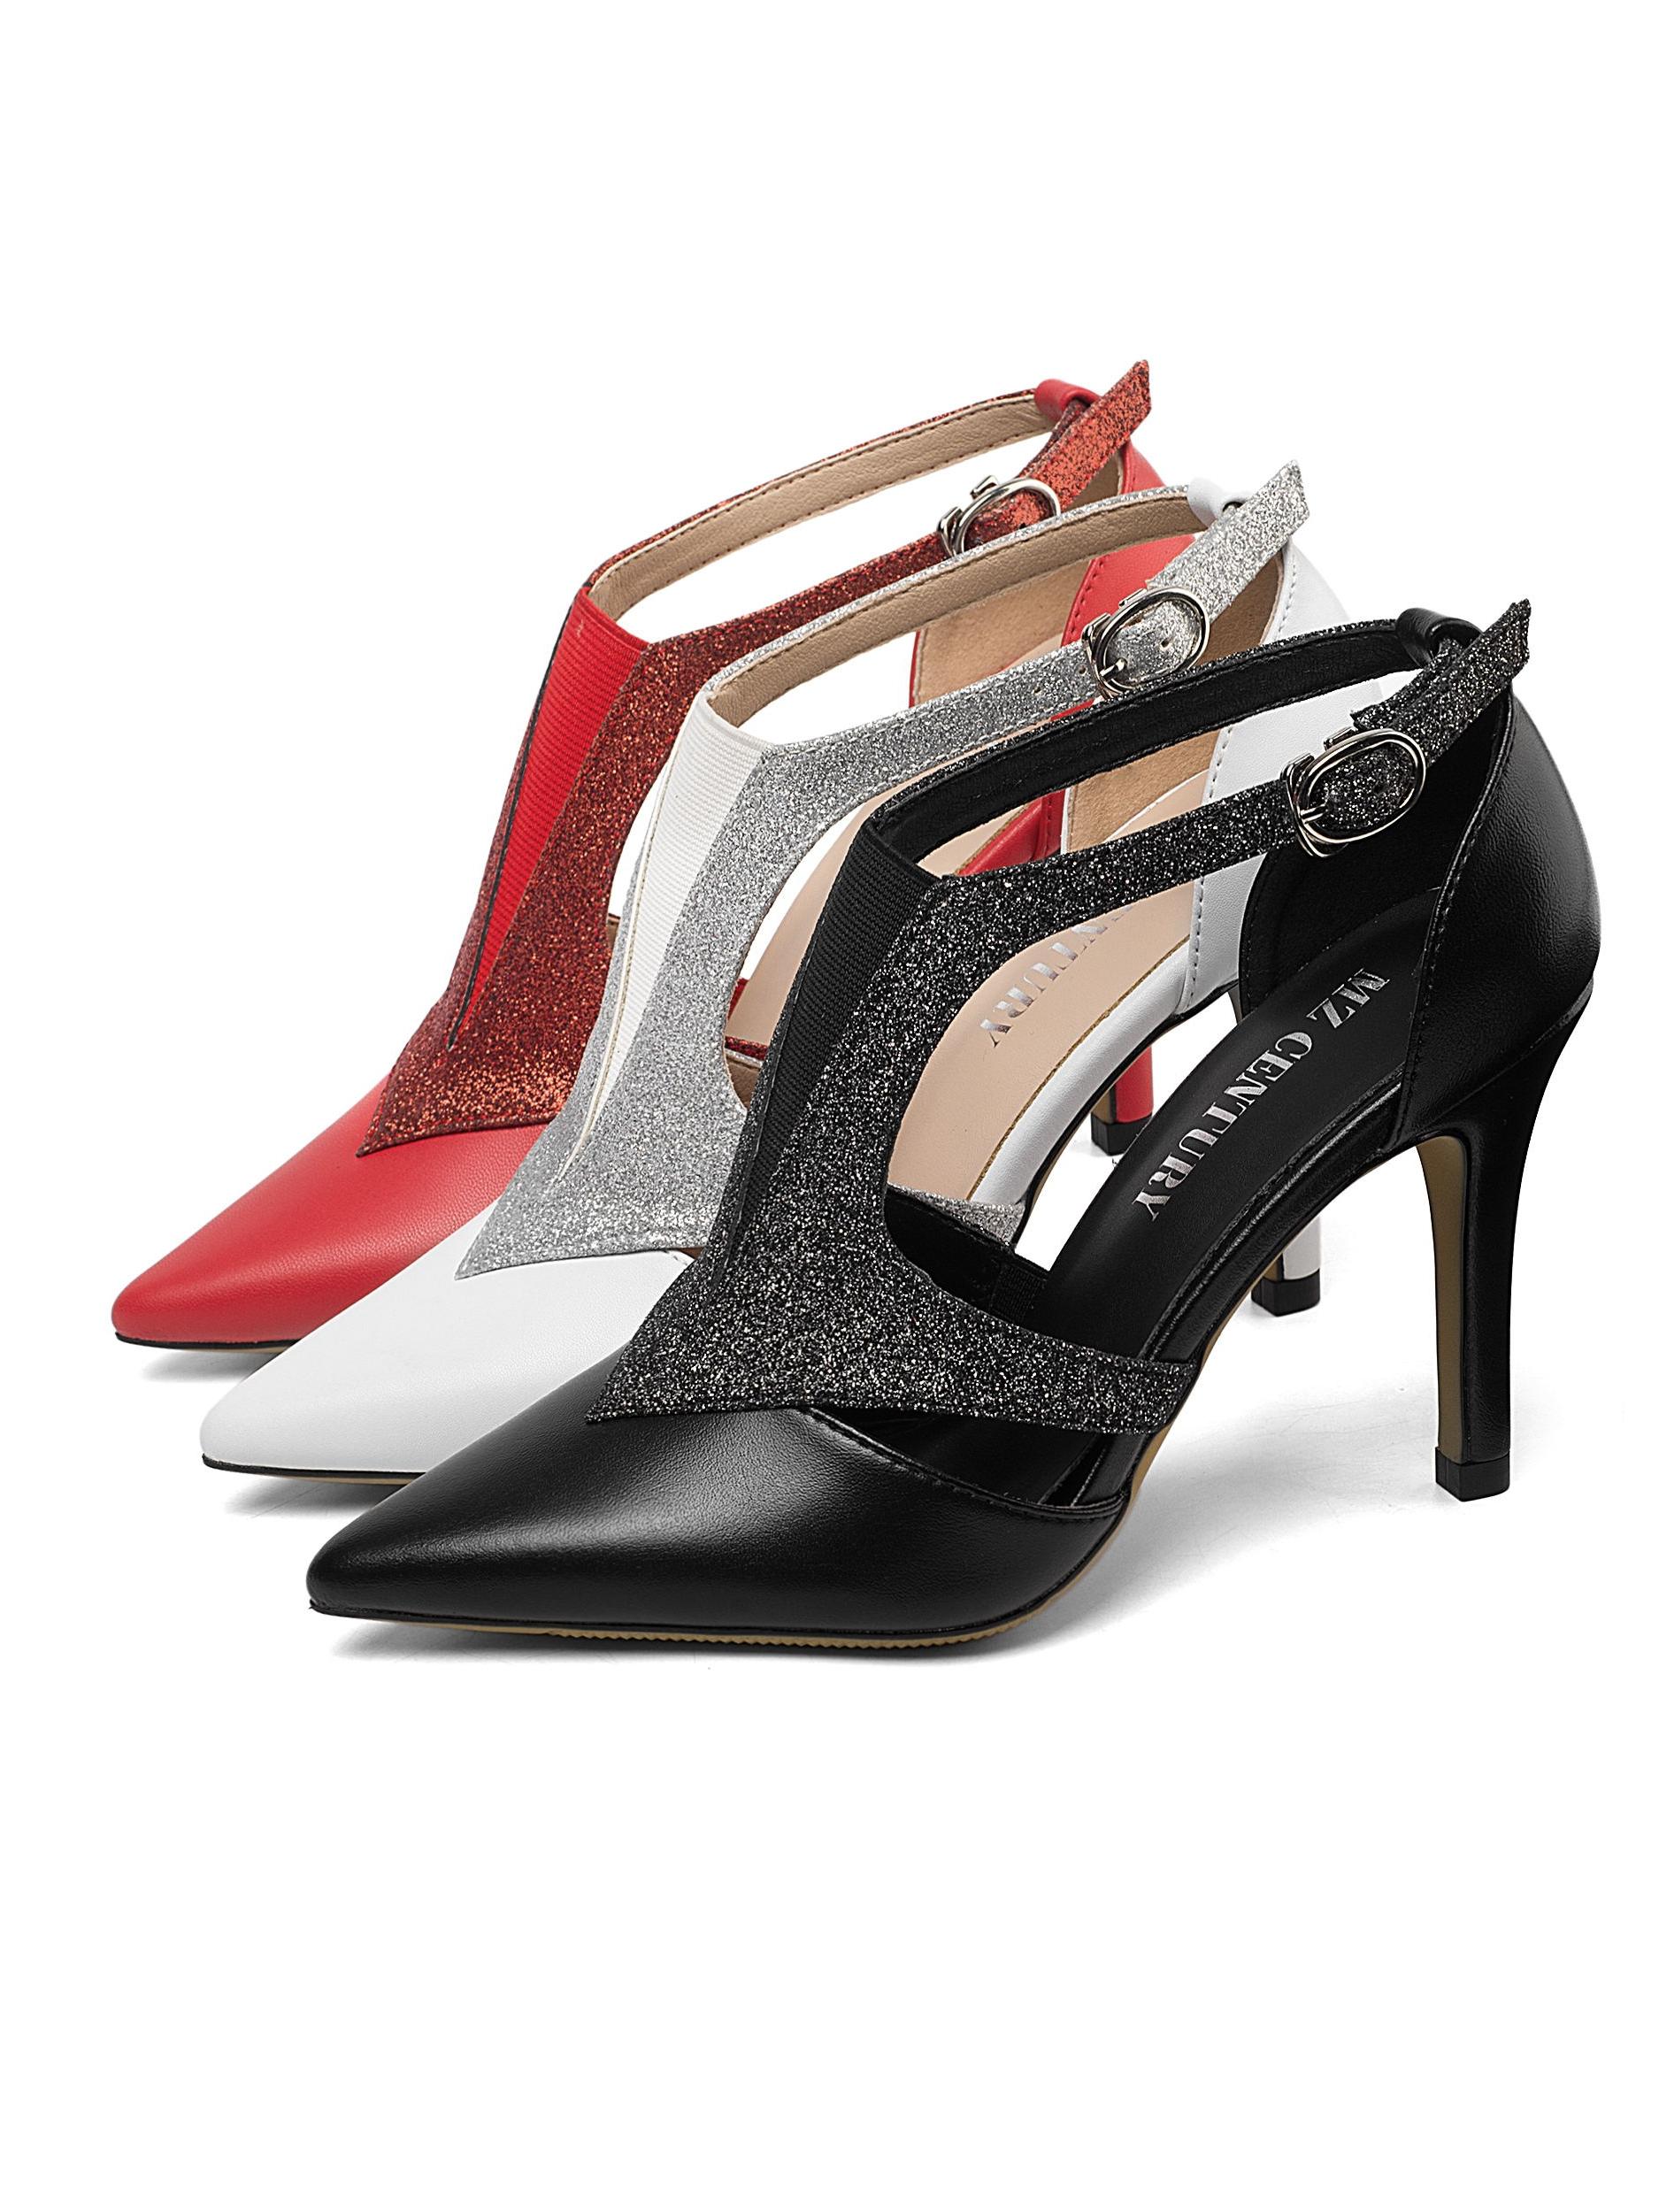 2021 new cowhide sandals thin high heel four seasons pointed hollow buckle anti slip Roman ol womens single shoe